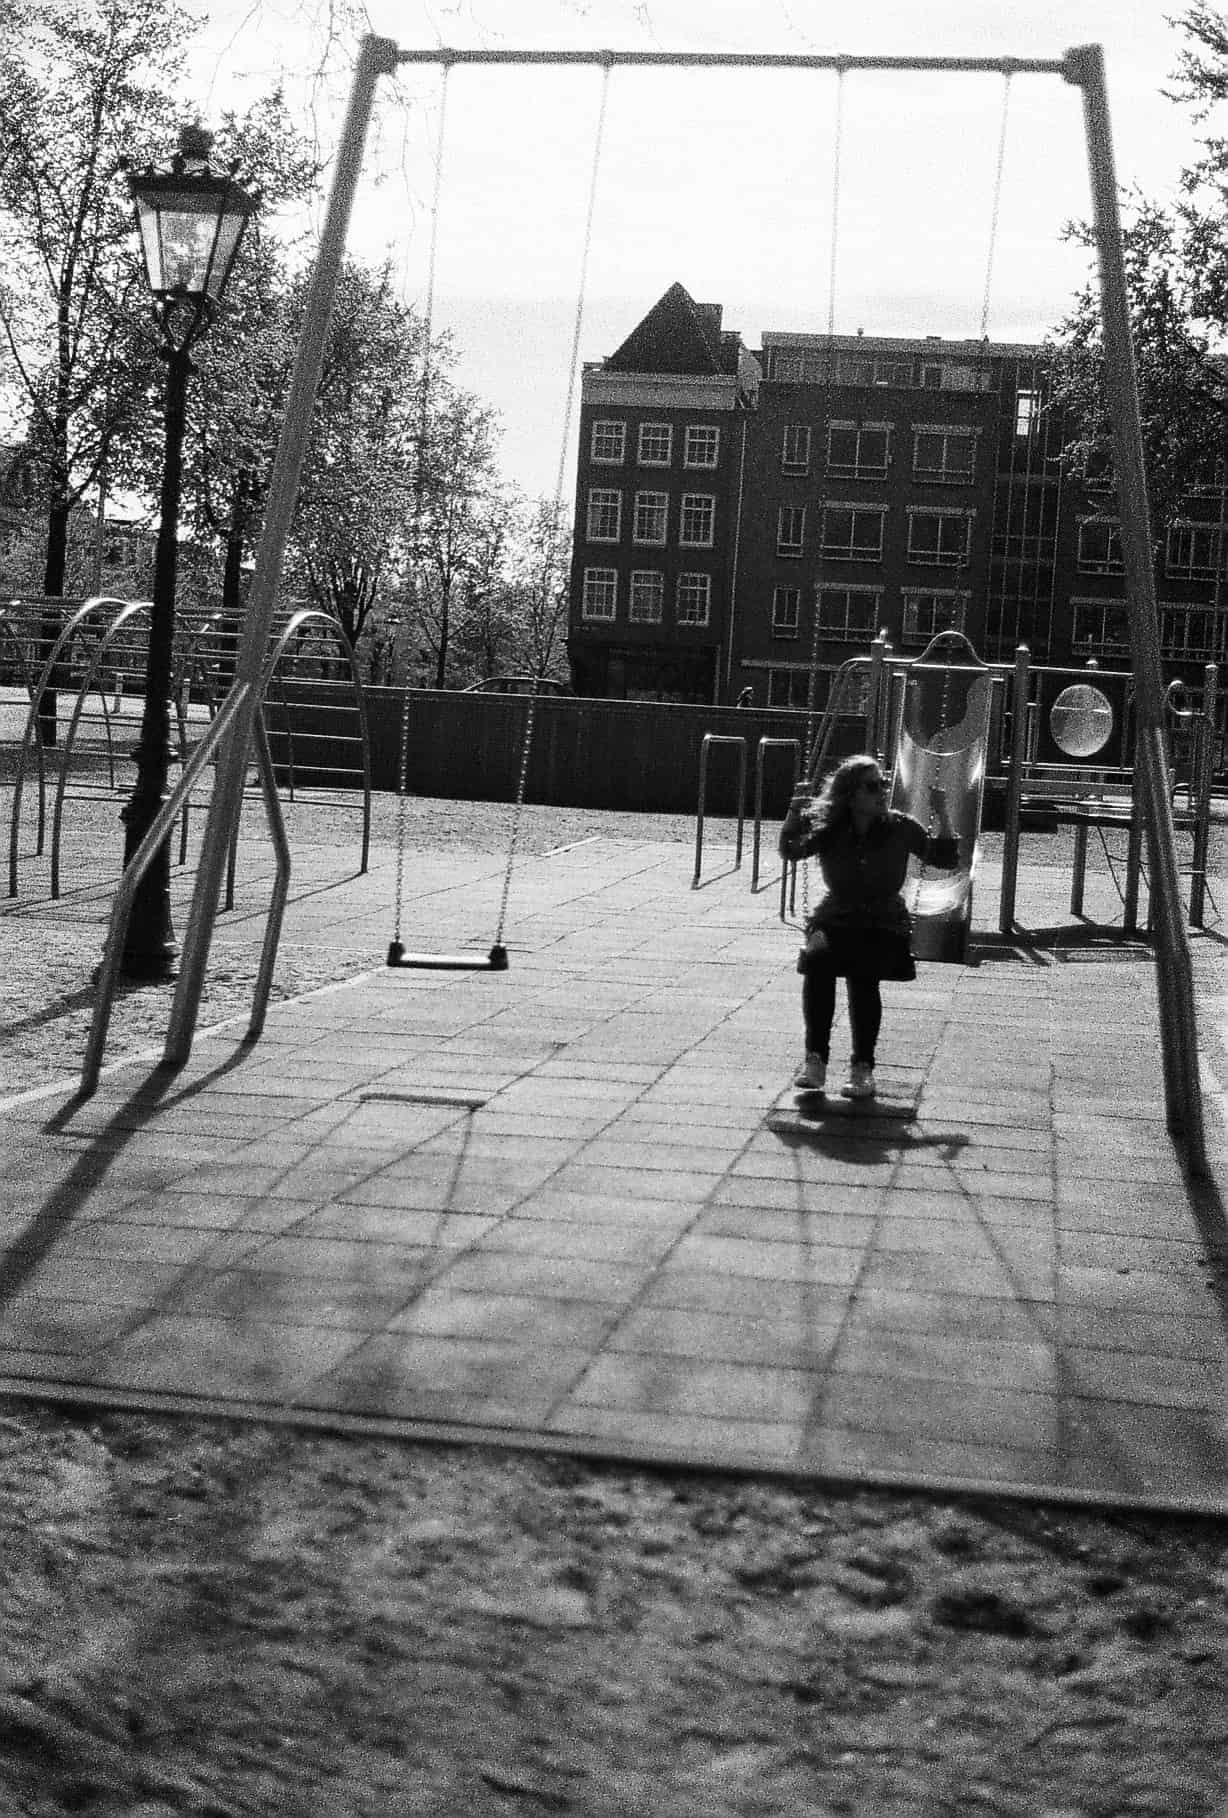 Amsterdam Swings